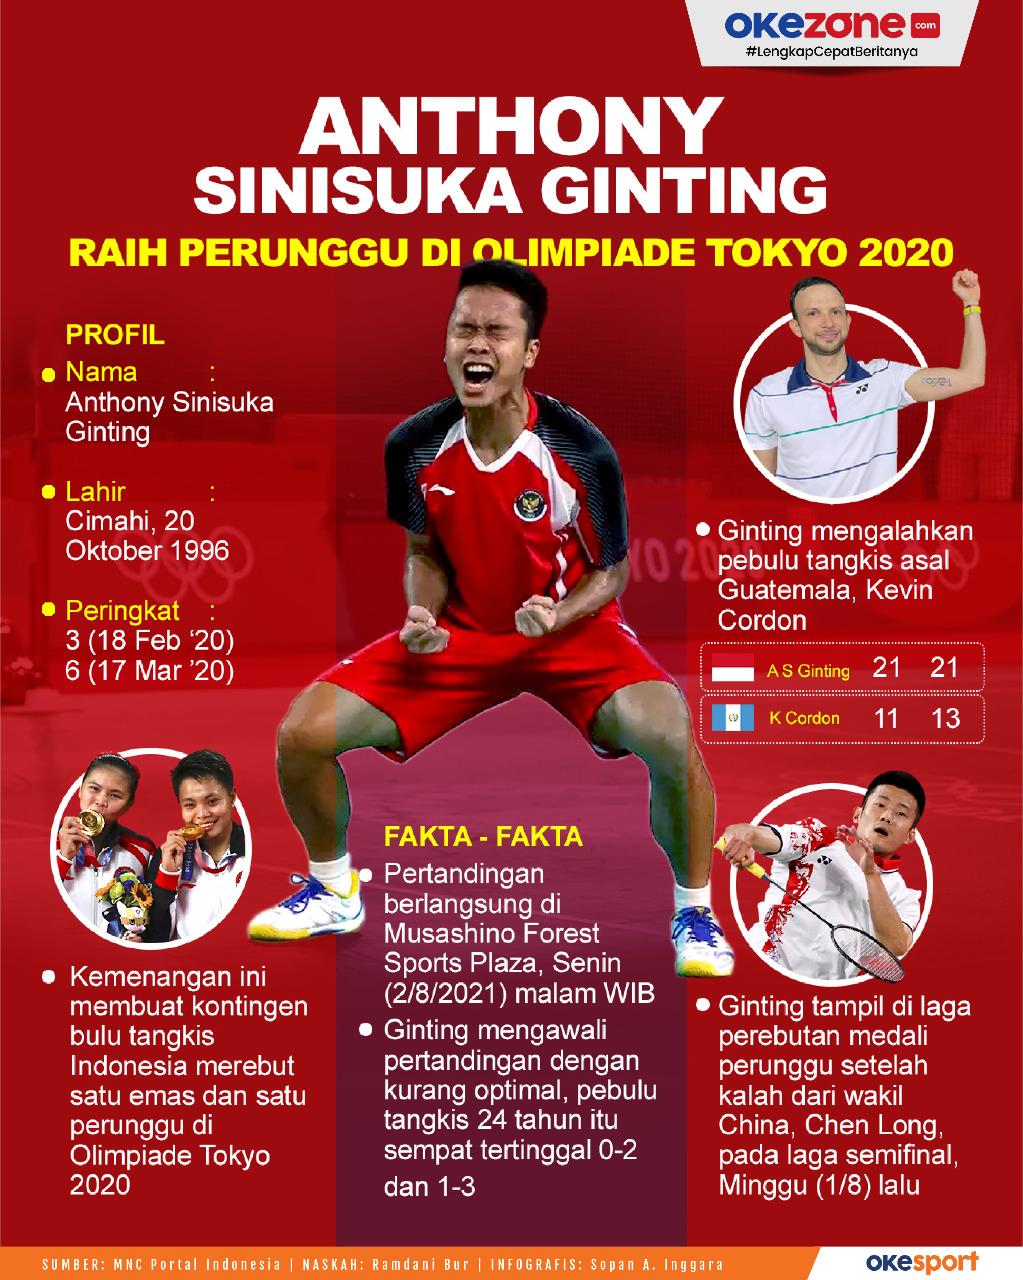 Anthony Sinisuka Ginting Raih Perunggu di Olimpiade Tokyo 2020 -